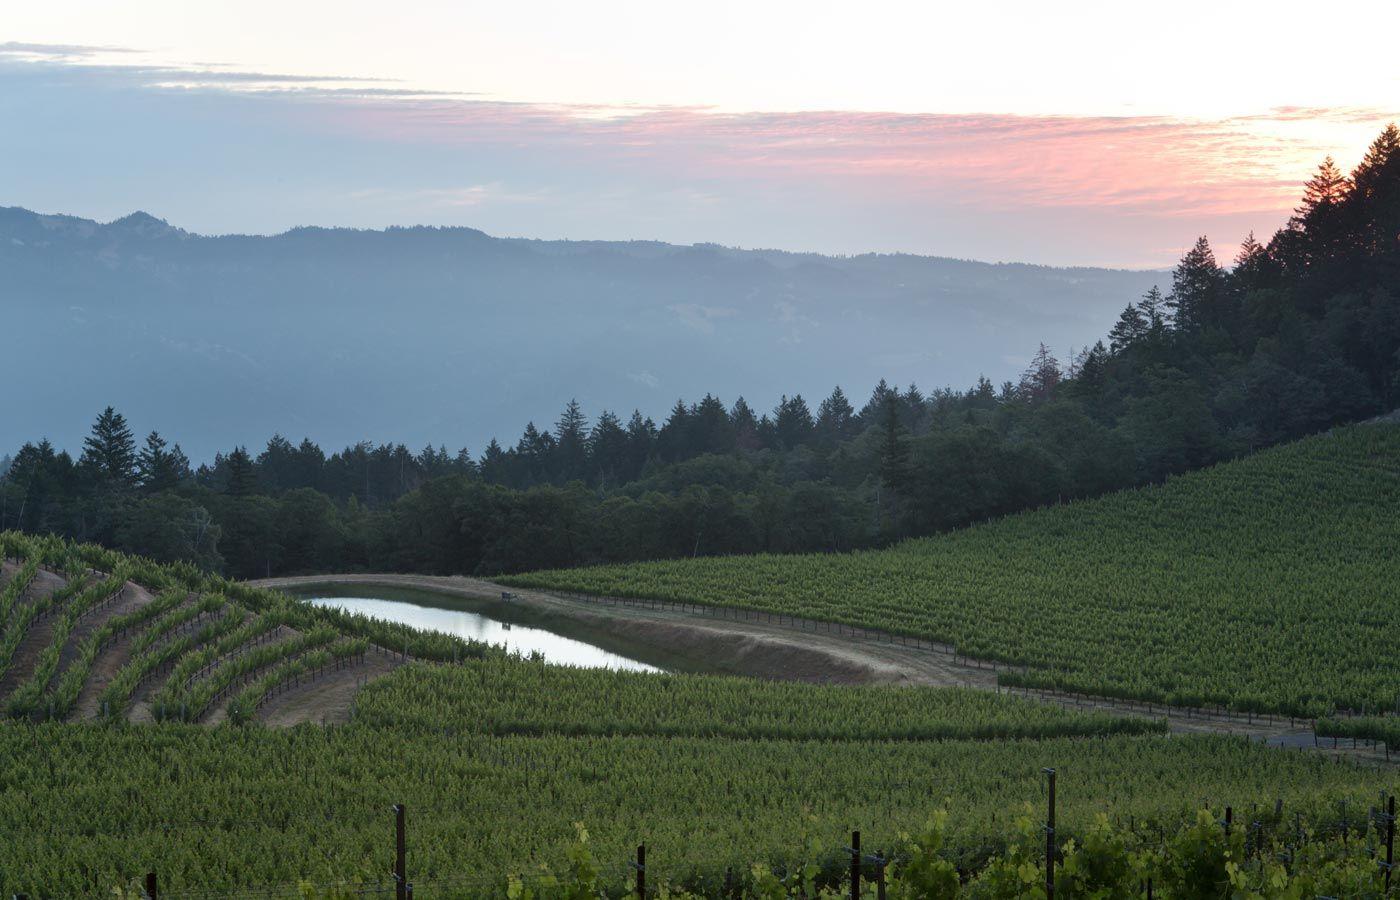 Pride Mountain Vineyards - Home